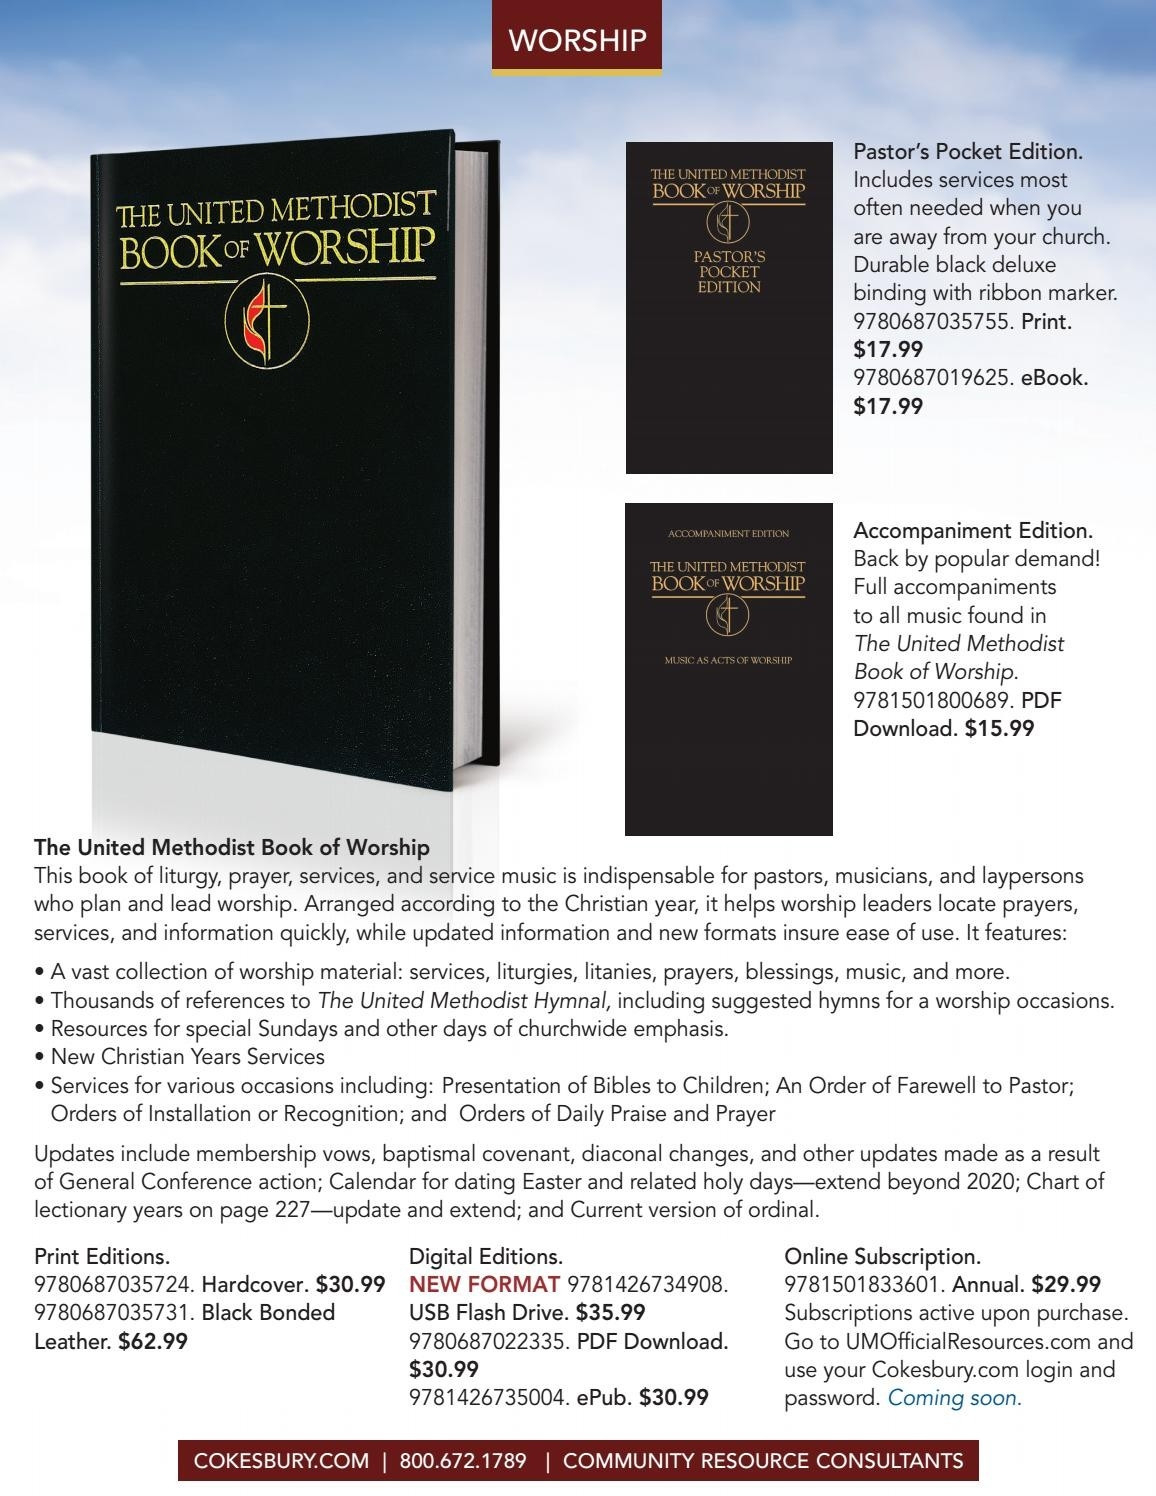 Methodist Lectionary Calendar 2020 - Template Calendar Design  United Methodist Church 2021 Liturgical Calendar